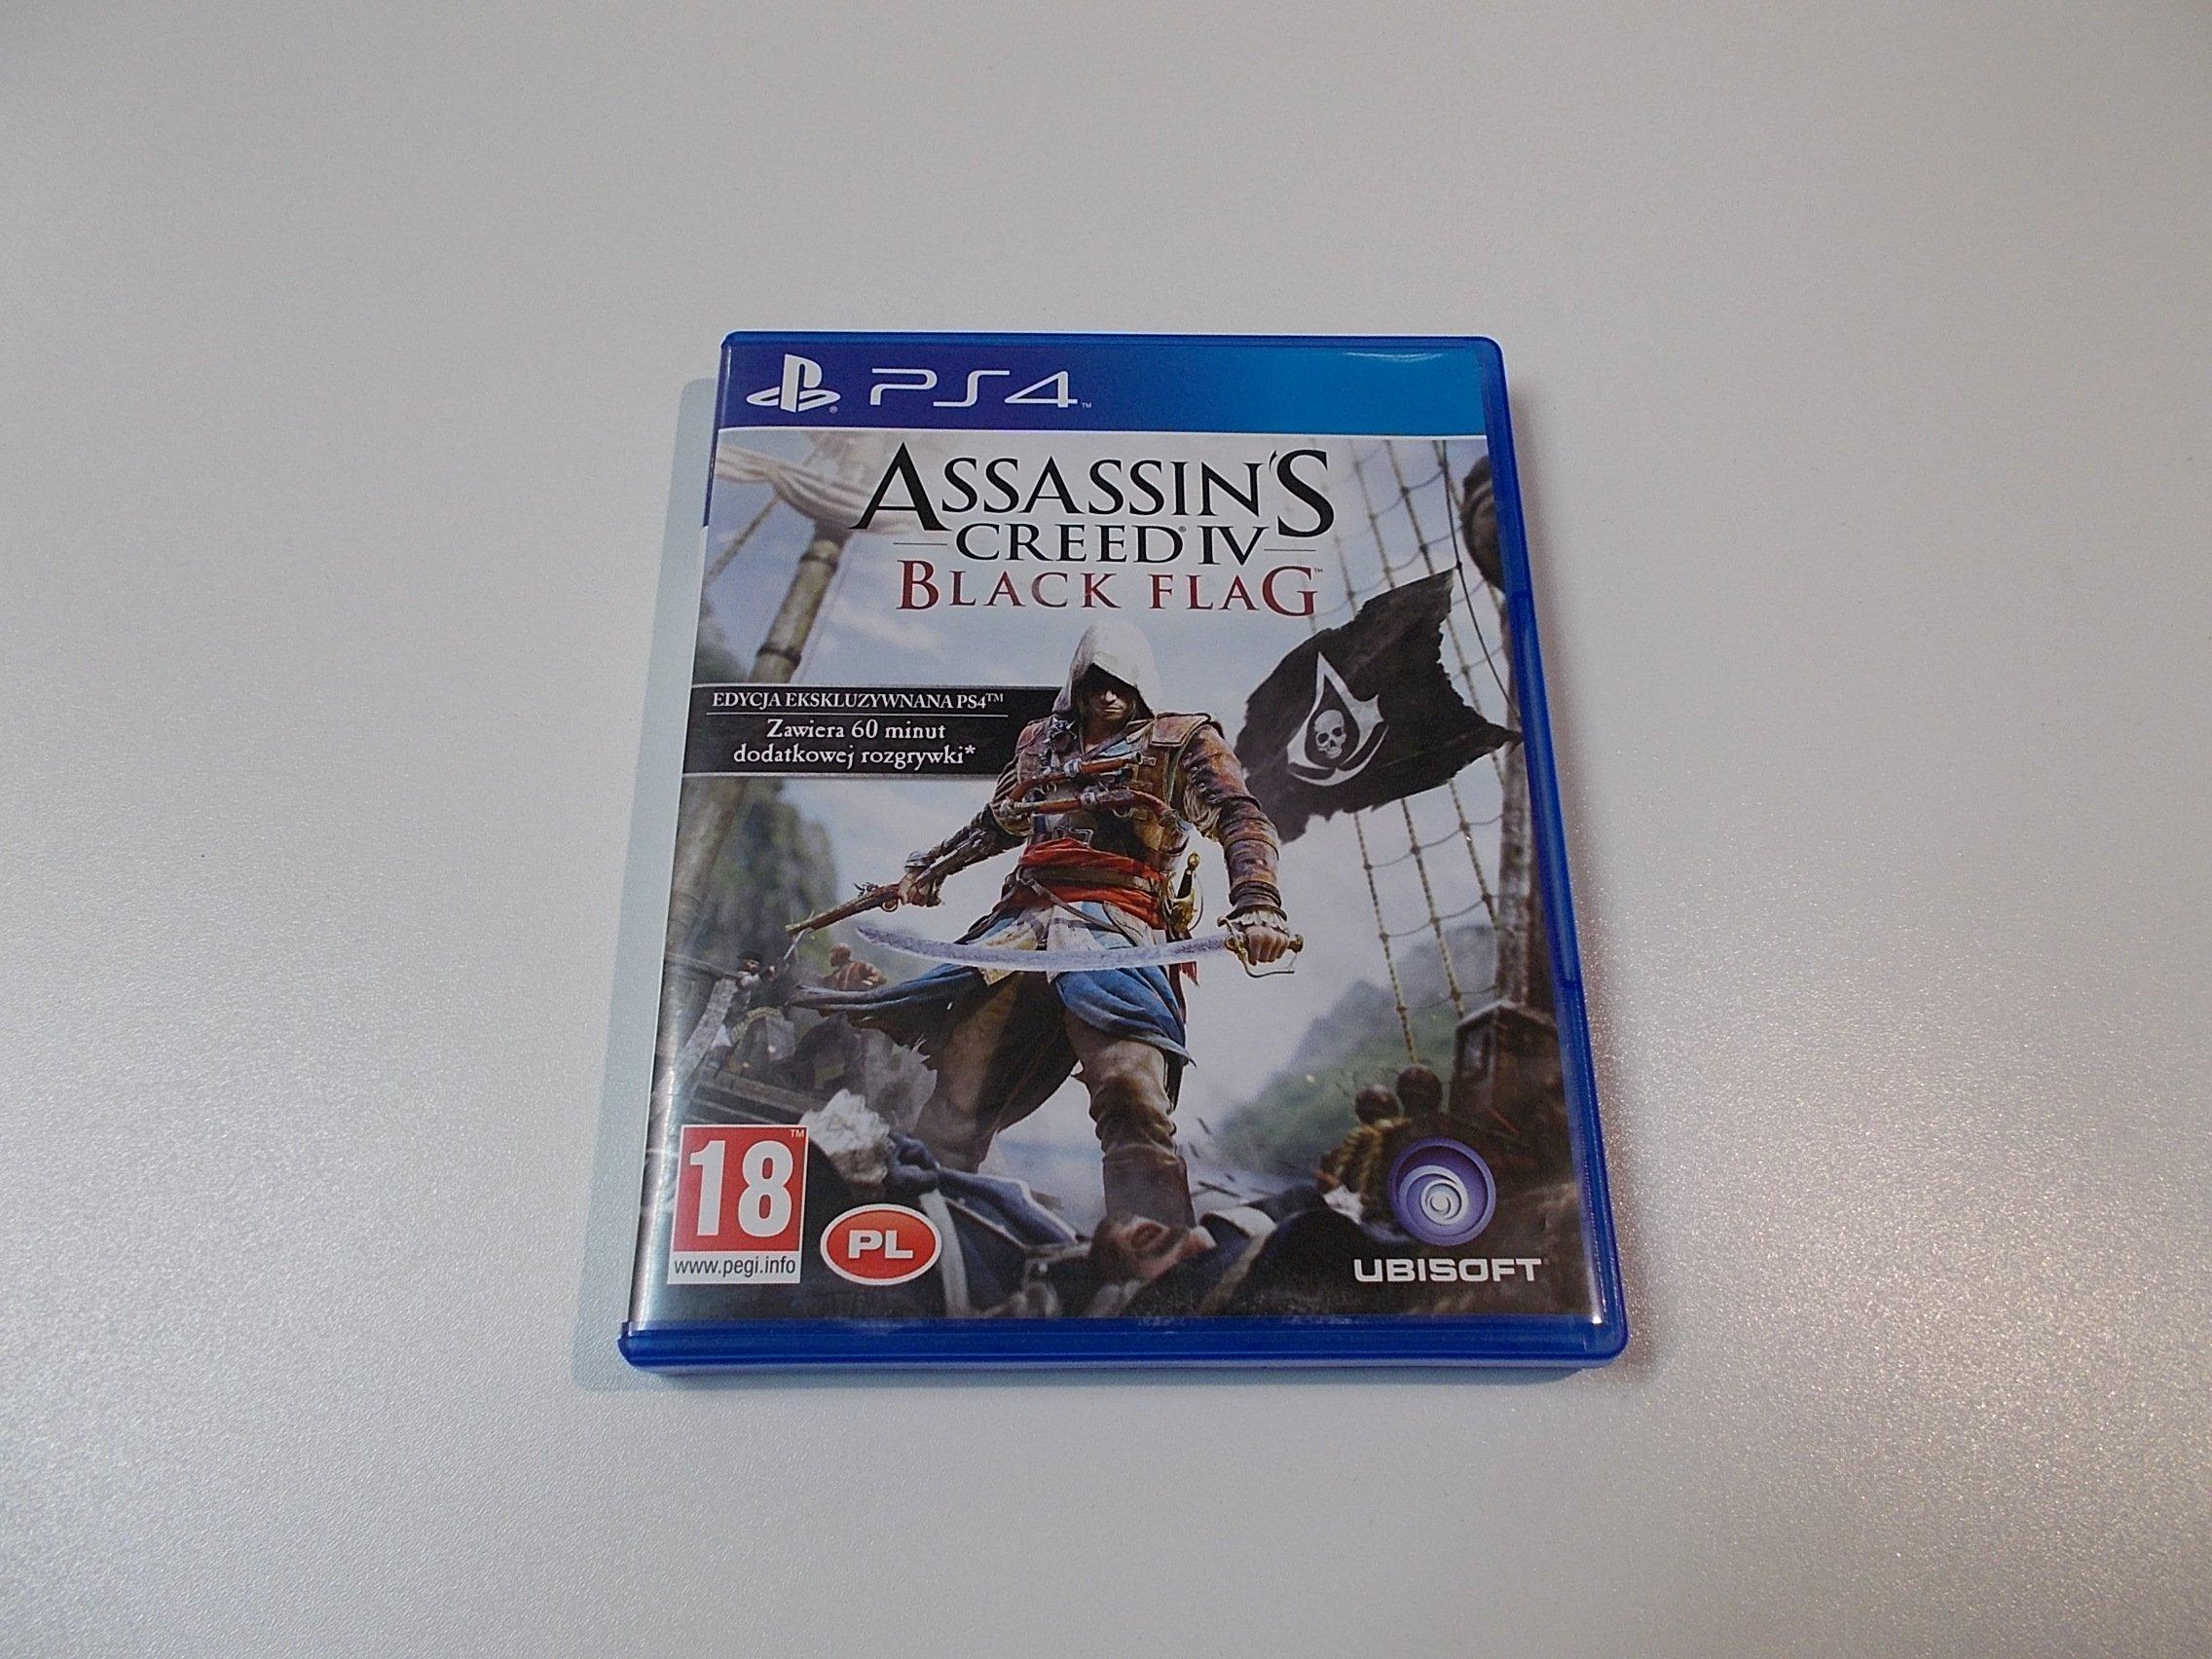 Assassins Creed IV Black Flag PL - GRA Ps4 - 0358